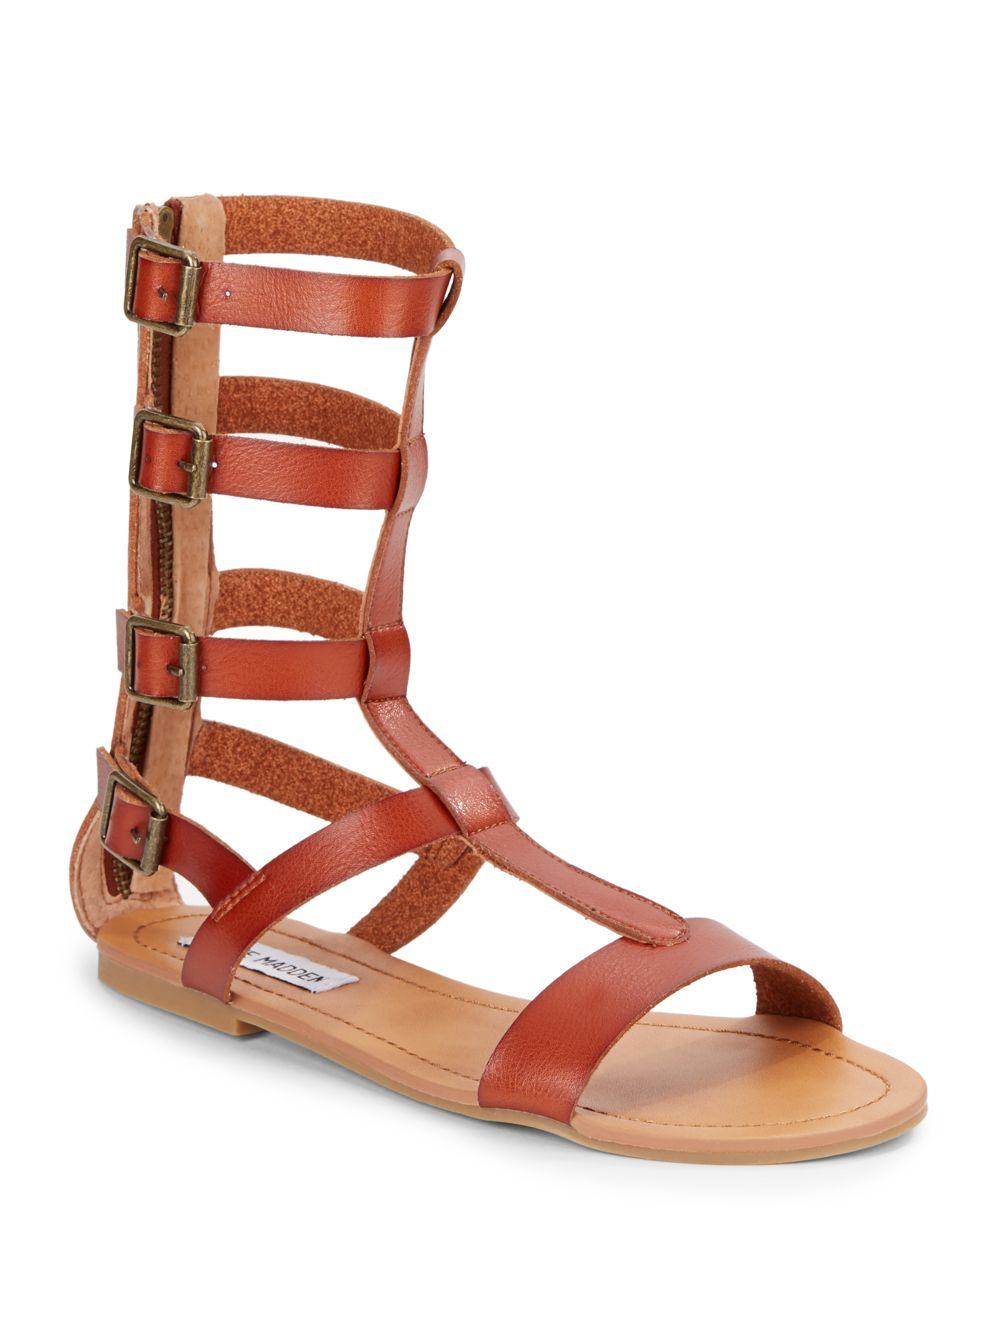 Sandals Upper Design